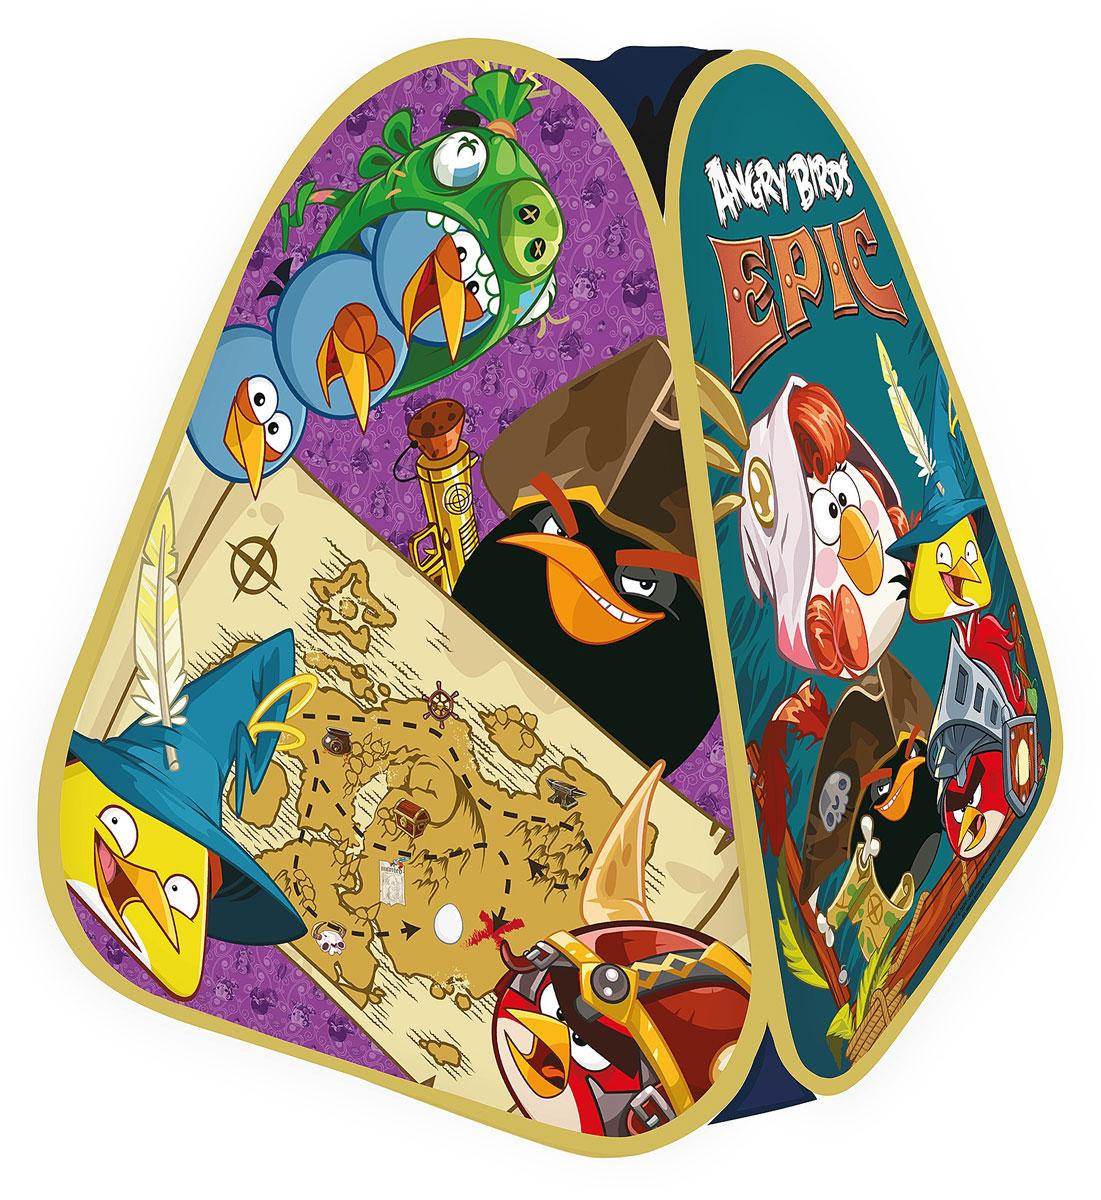 1TOY Детская игровая палатка Angry Birds Epic в сумке 90 х 80 х 80 смТ575081TOY Angry Birds Epic детская игровая палатка в сумке 90х80х80см